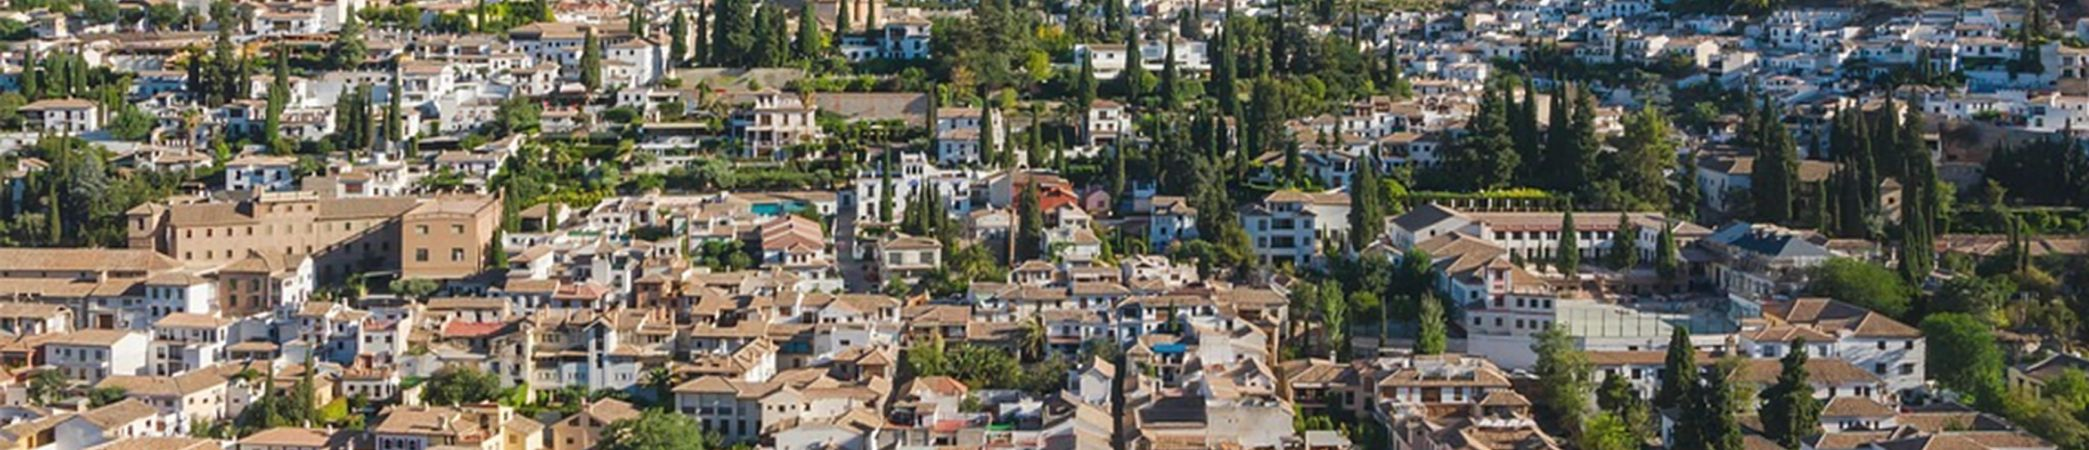 Granada in 400 words